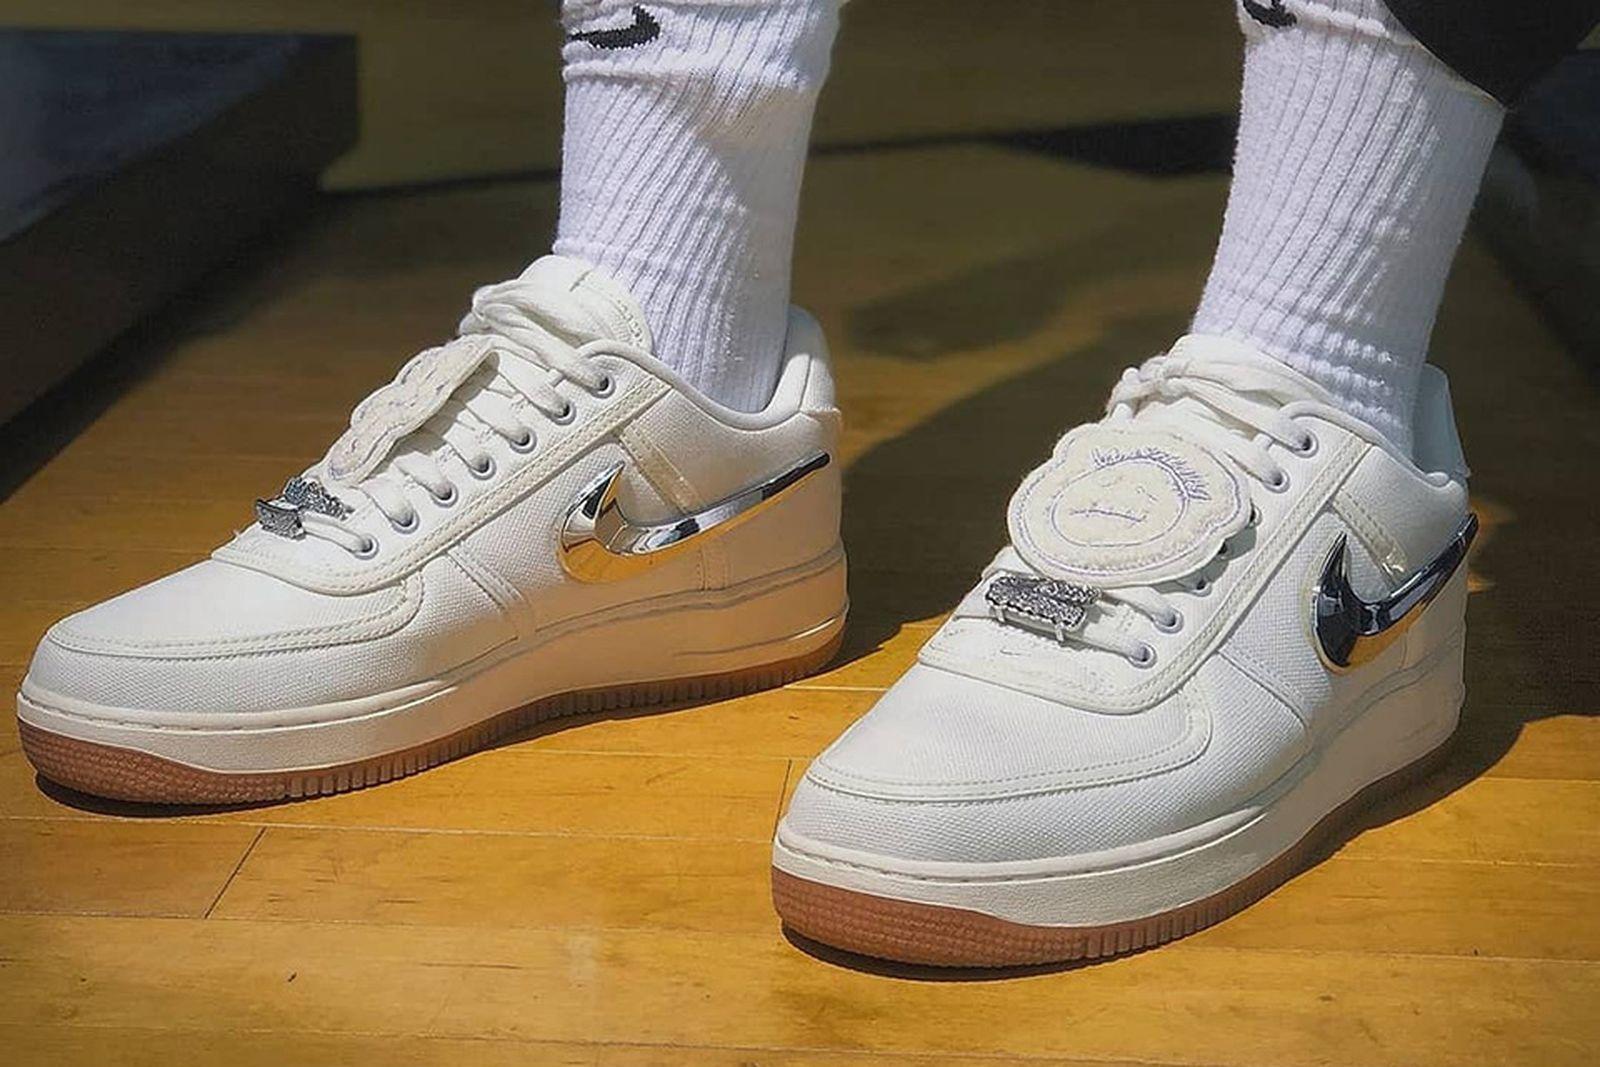 tímido Todo el mundo Miserable  Here's How Instagram Is Wearing the Travis Scott Nike Air Force 1